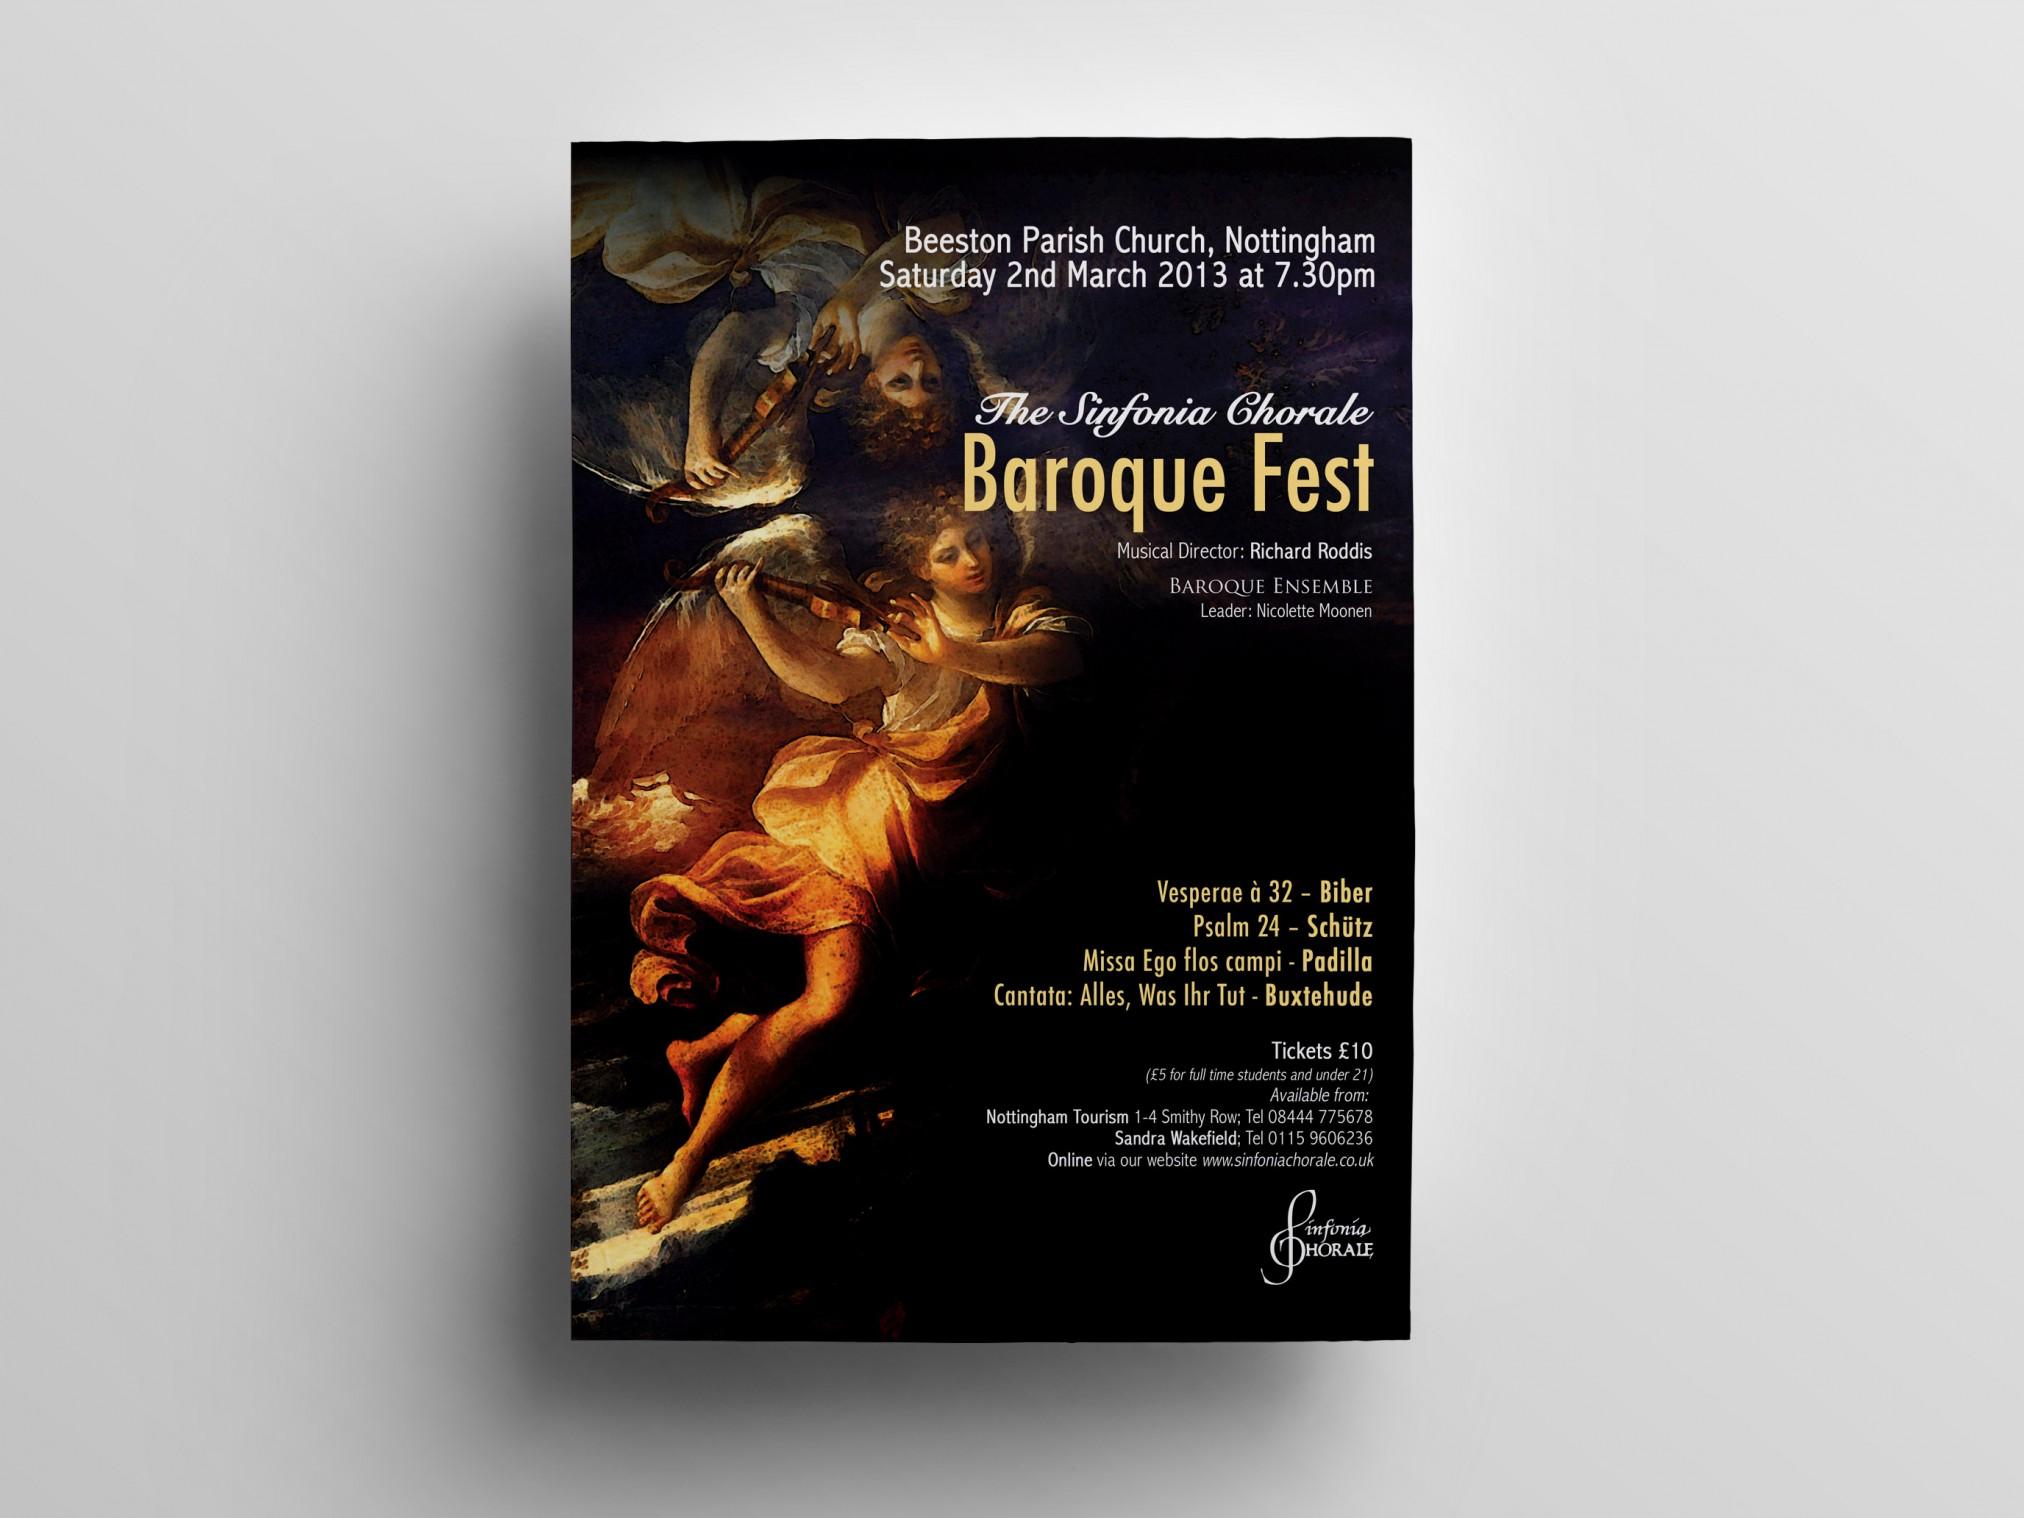 Baroque Fest Sinfonia